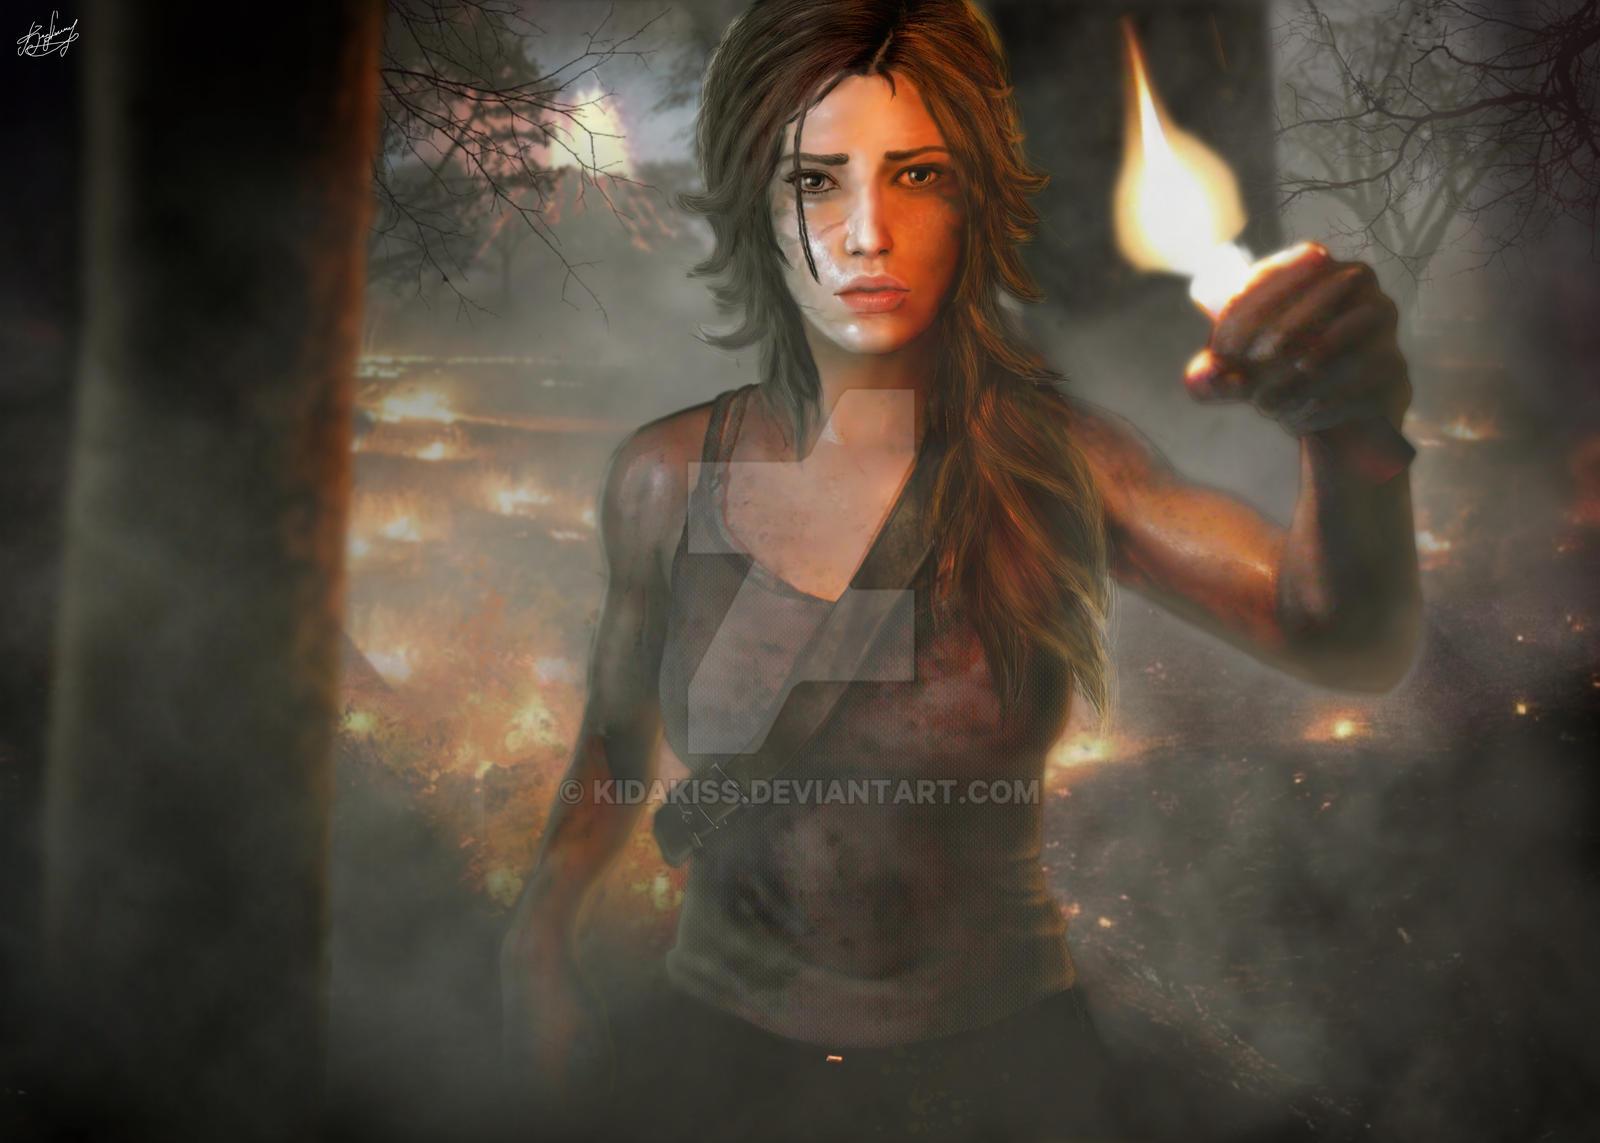 Lara Croft Young (Tomb Raider 2013) by KidaKiss